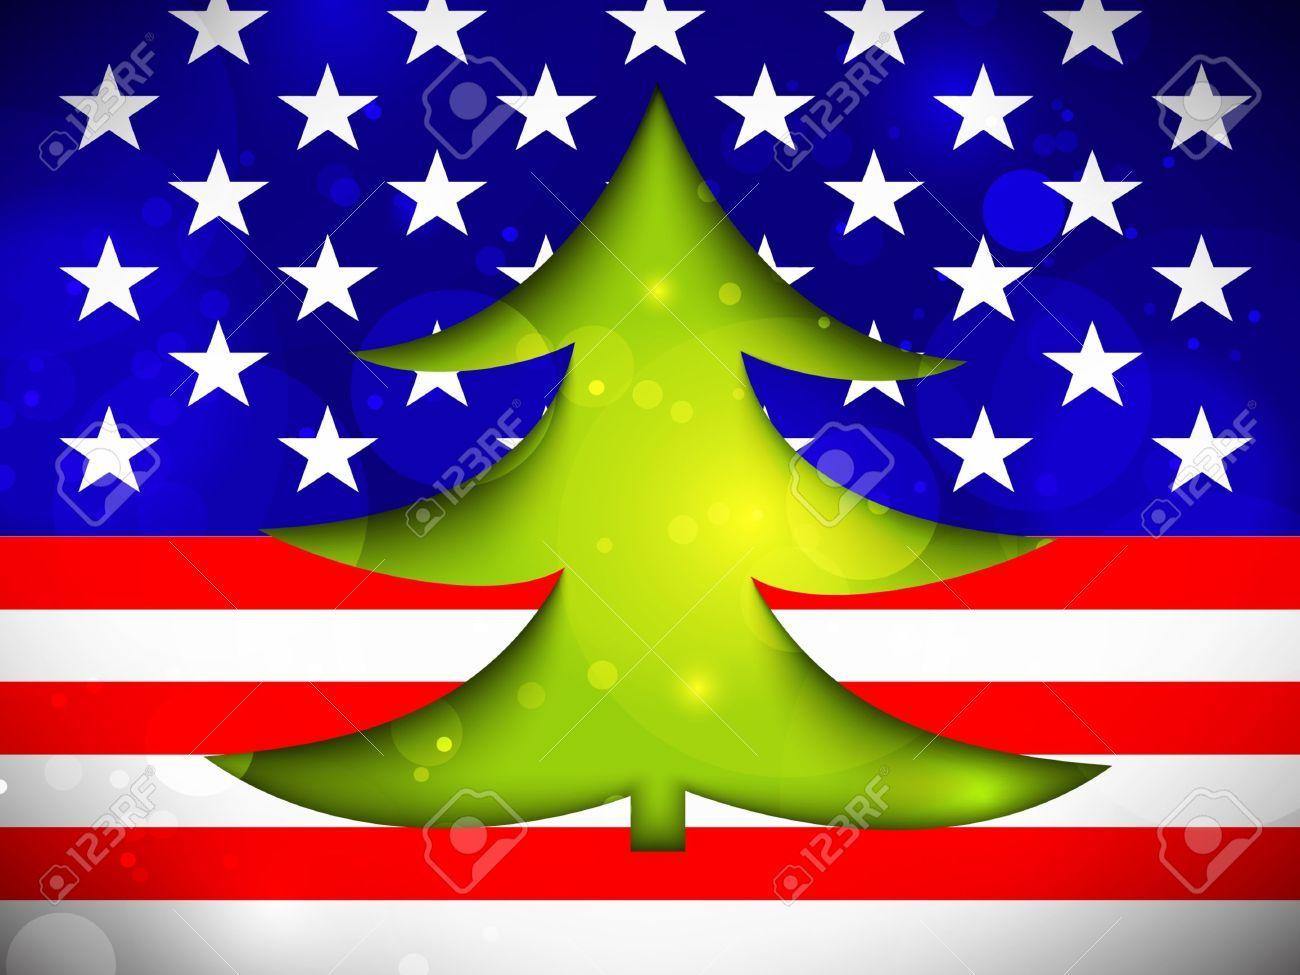 Christmas american flag clipart vector free download Stock Vector   School Christmas Program   Christmas tree, Flag photo ... vector free download